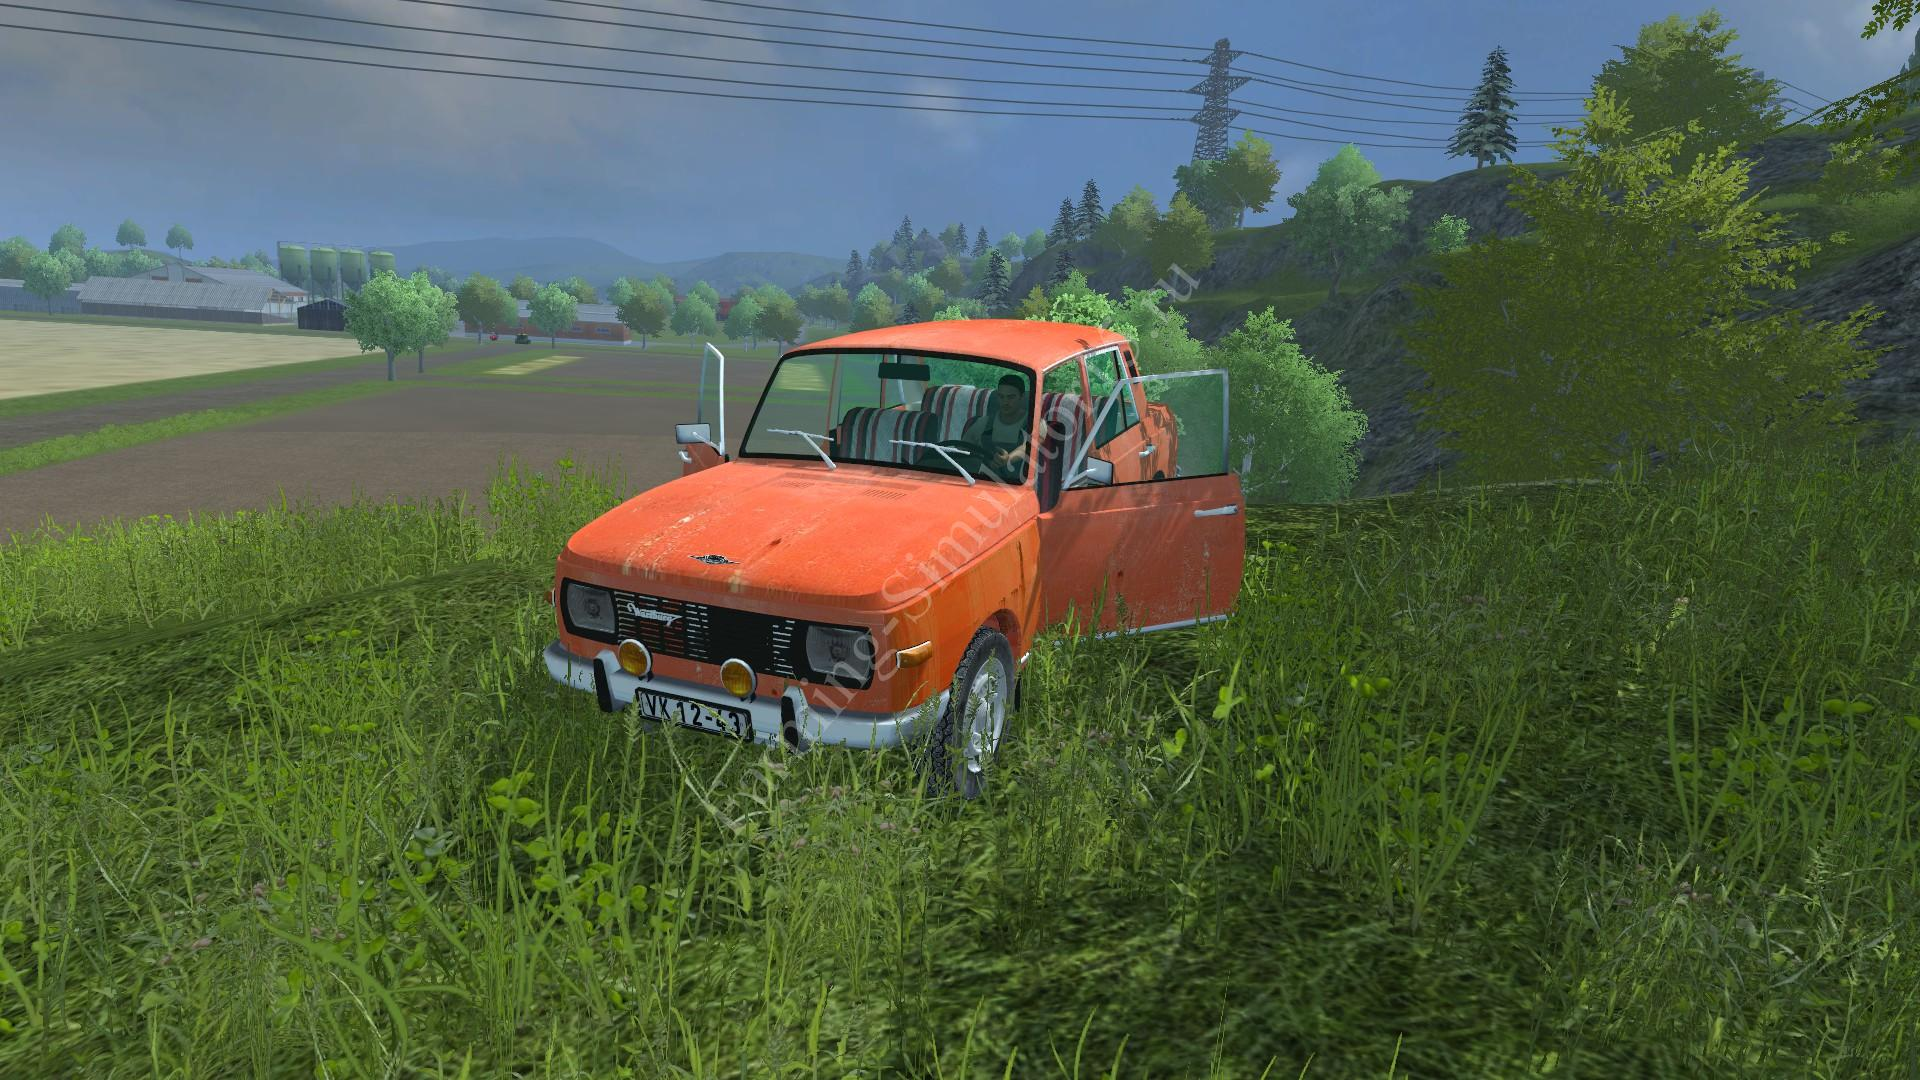 Мод легкового авто Wartburg 353 v 2.13 Farming Simulator 2013, Farming Simulator 13